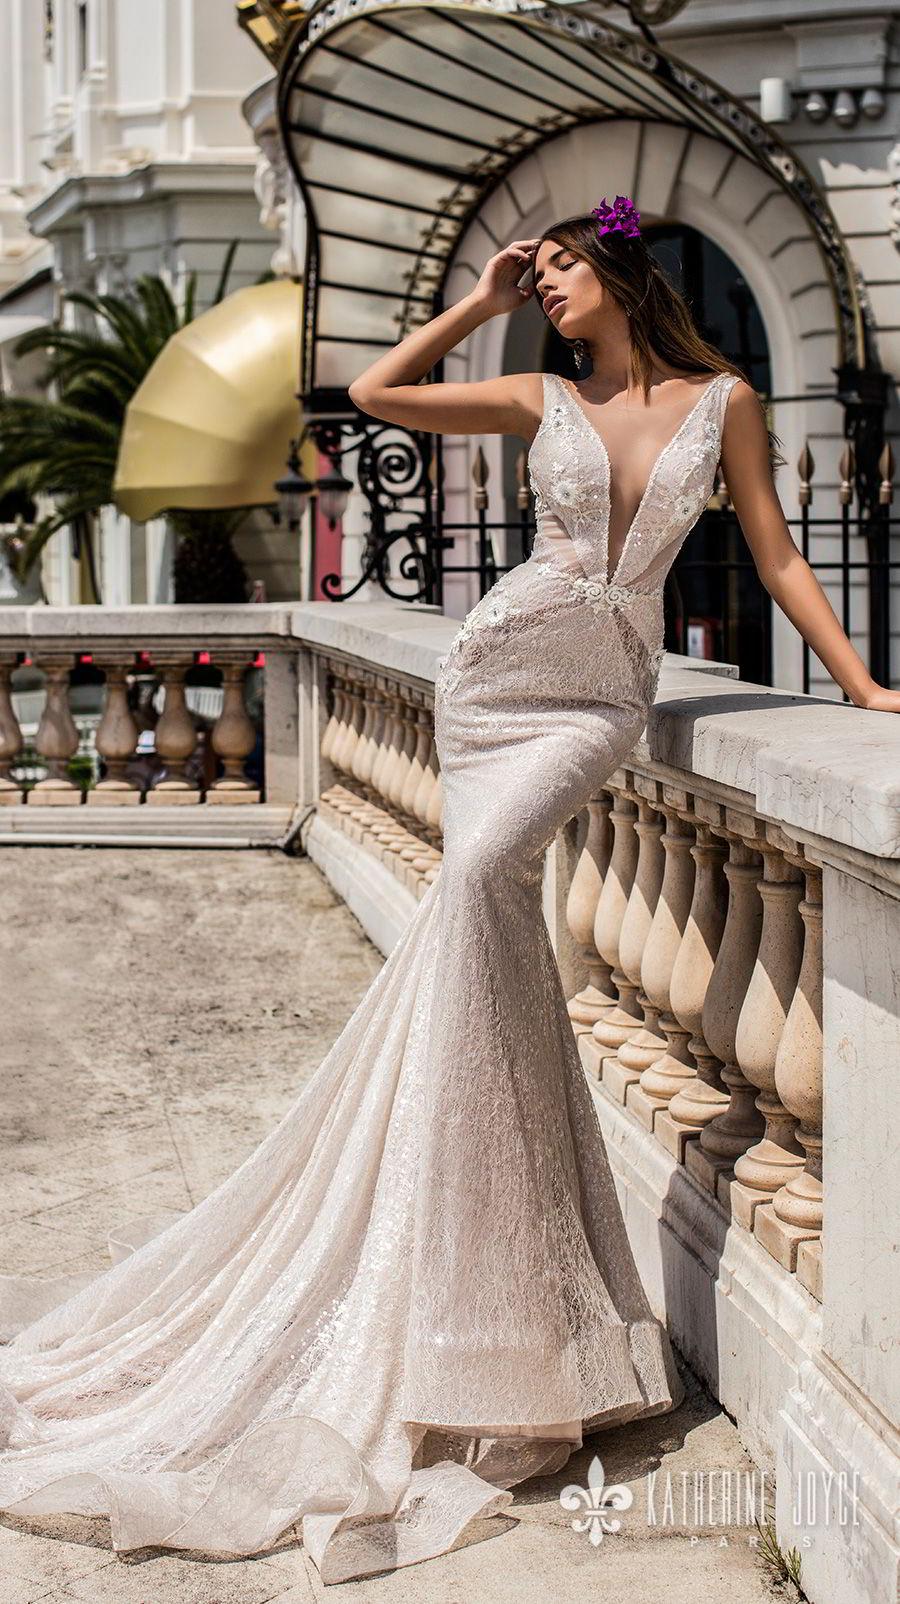 katherine joyce 2018 bridal sleeveless illusion bateau deep v neck full embellishment elegant sexy fit and flare wedding dress open back chapel train (alisiya) mv